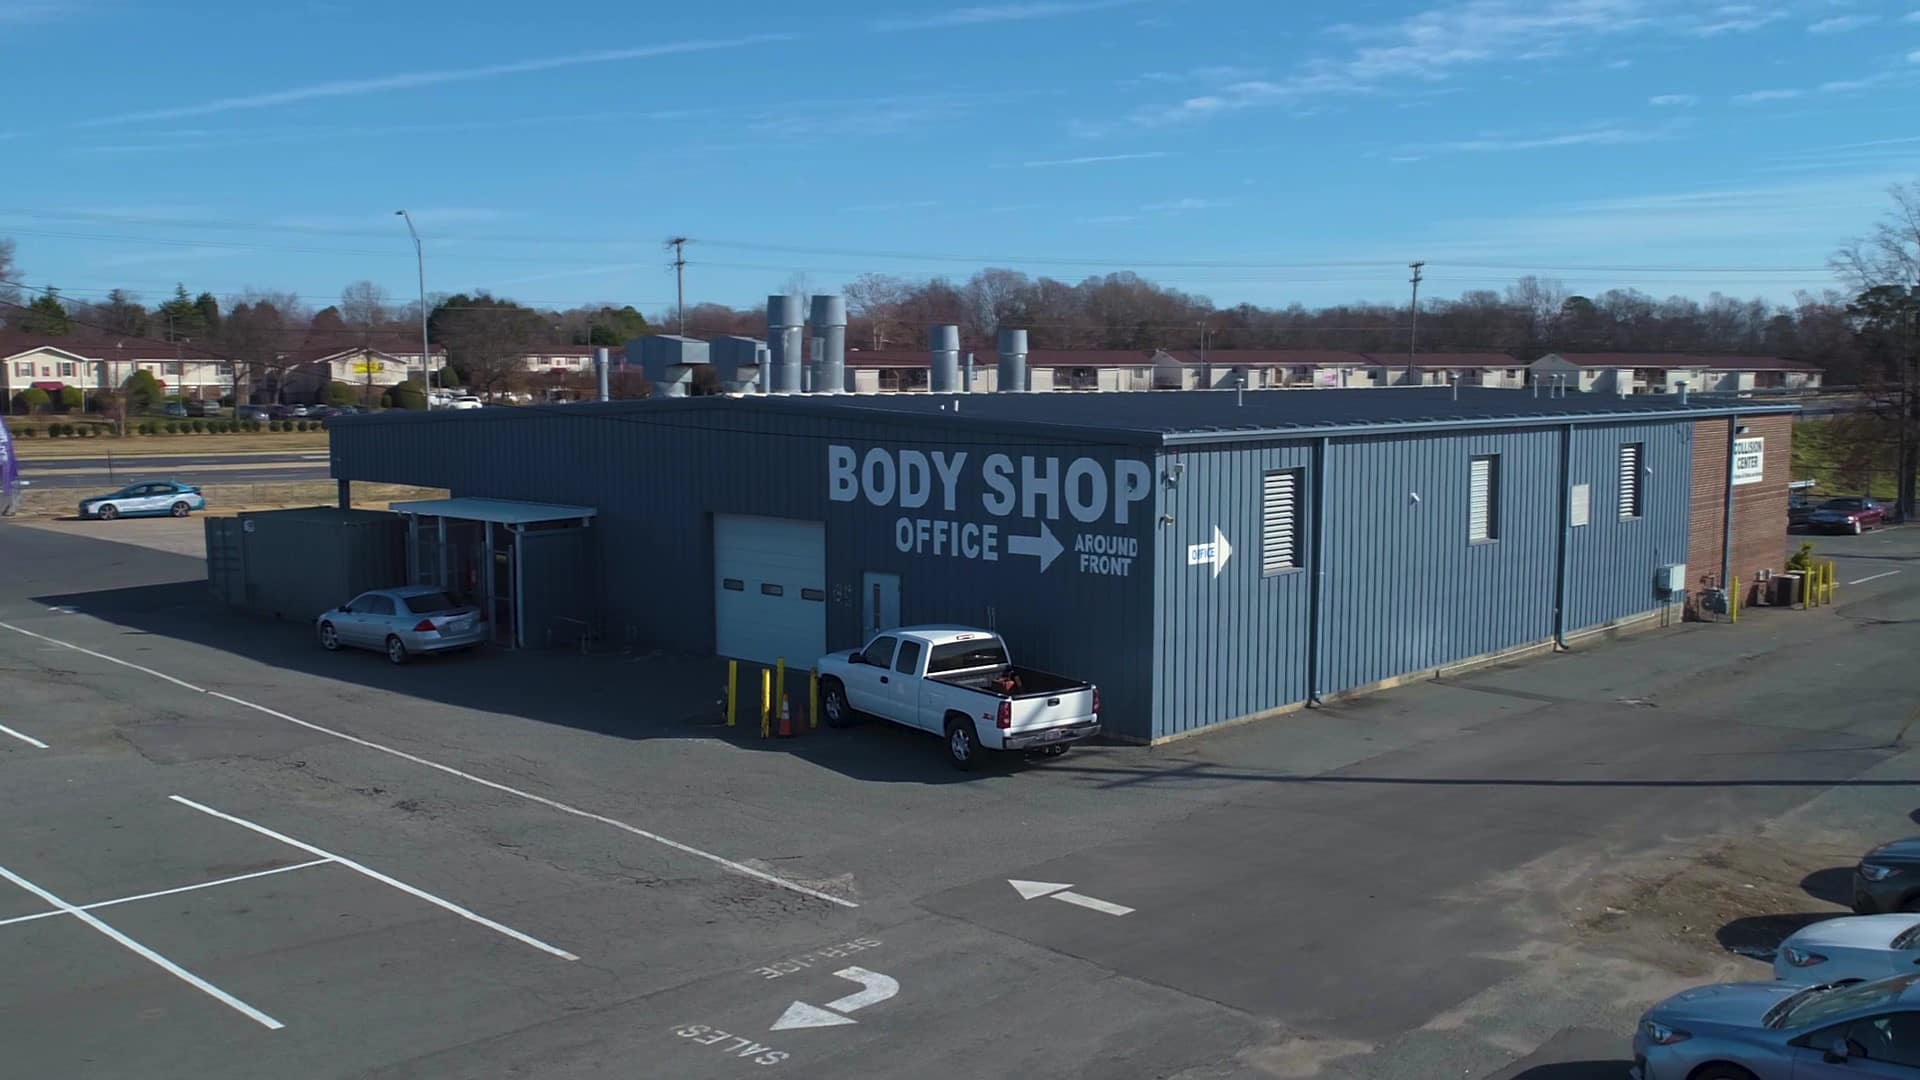 Drone shot of Williams Auto body shop in Charlotte, NC